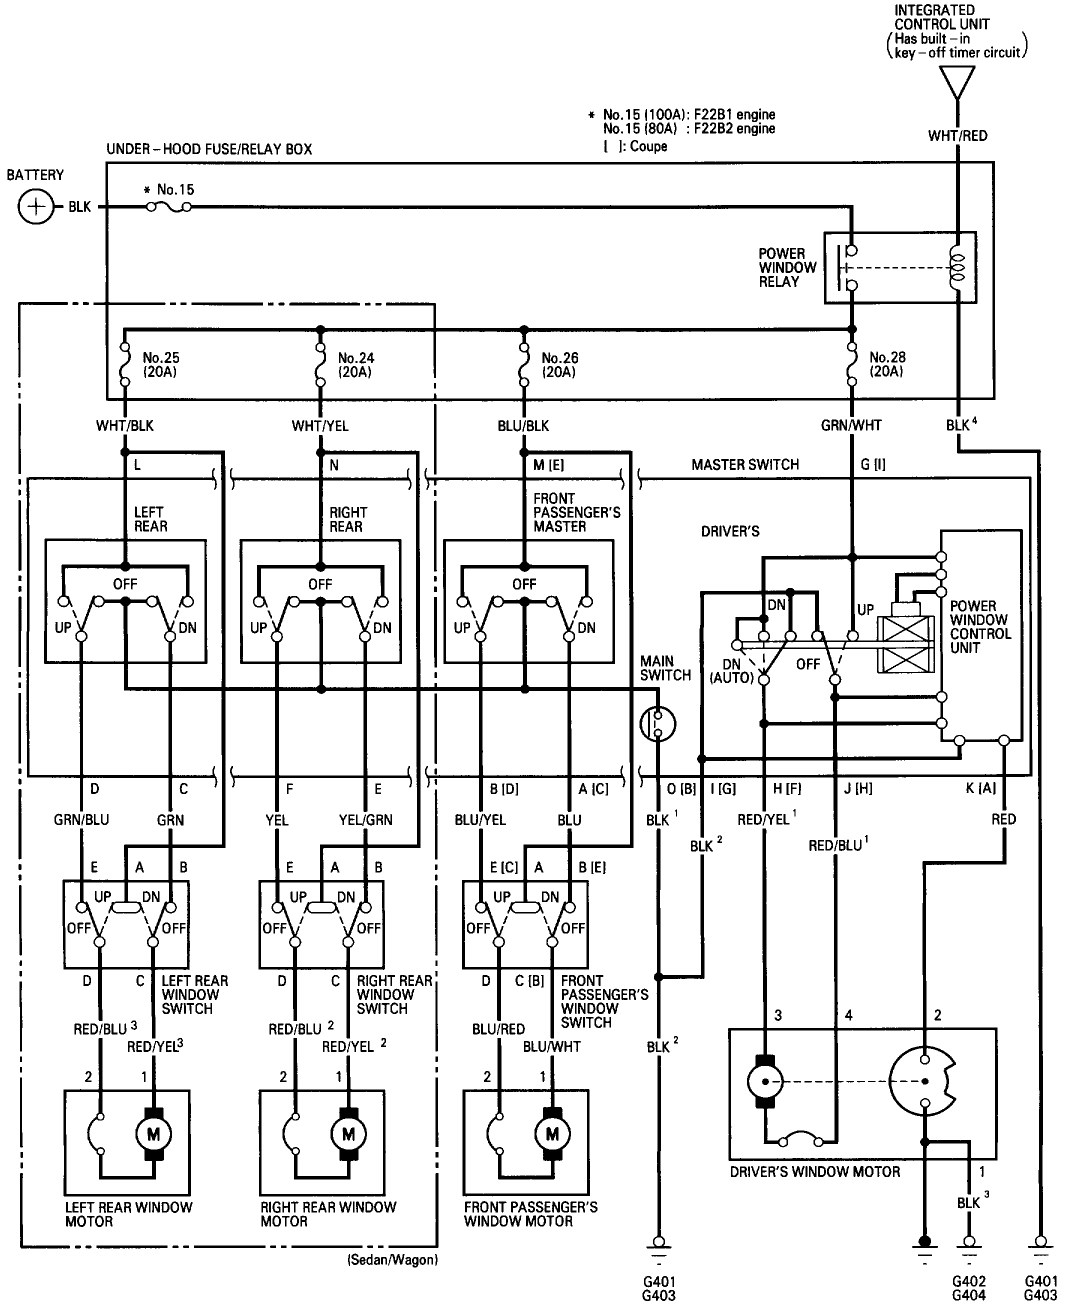 2009 honda crv wiring diagram bb 2676  fuse box diagram moreover 2000 honda cr v fuse box  fuse box diagram moreover 2000 honda cr